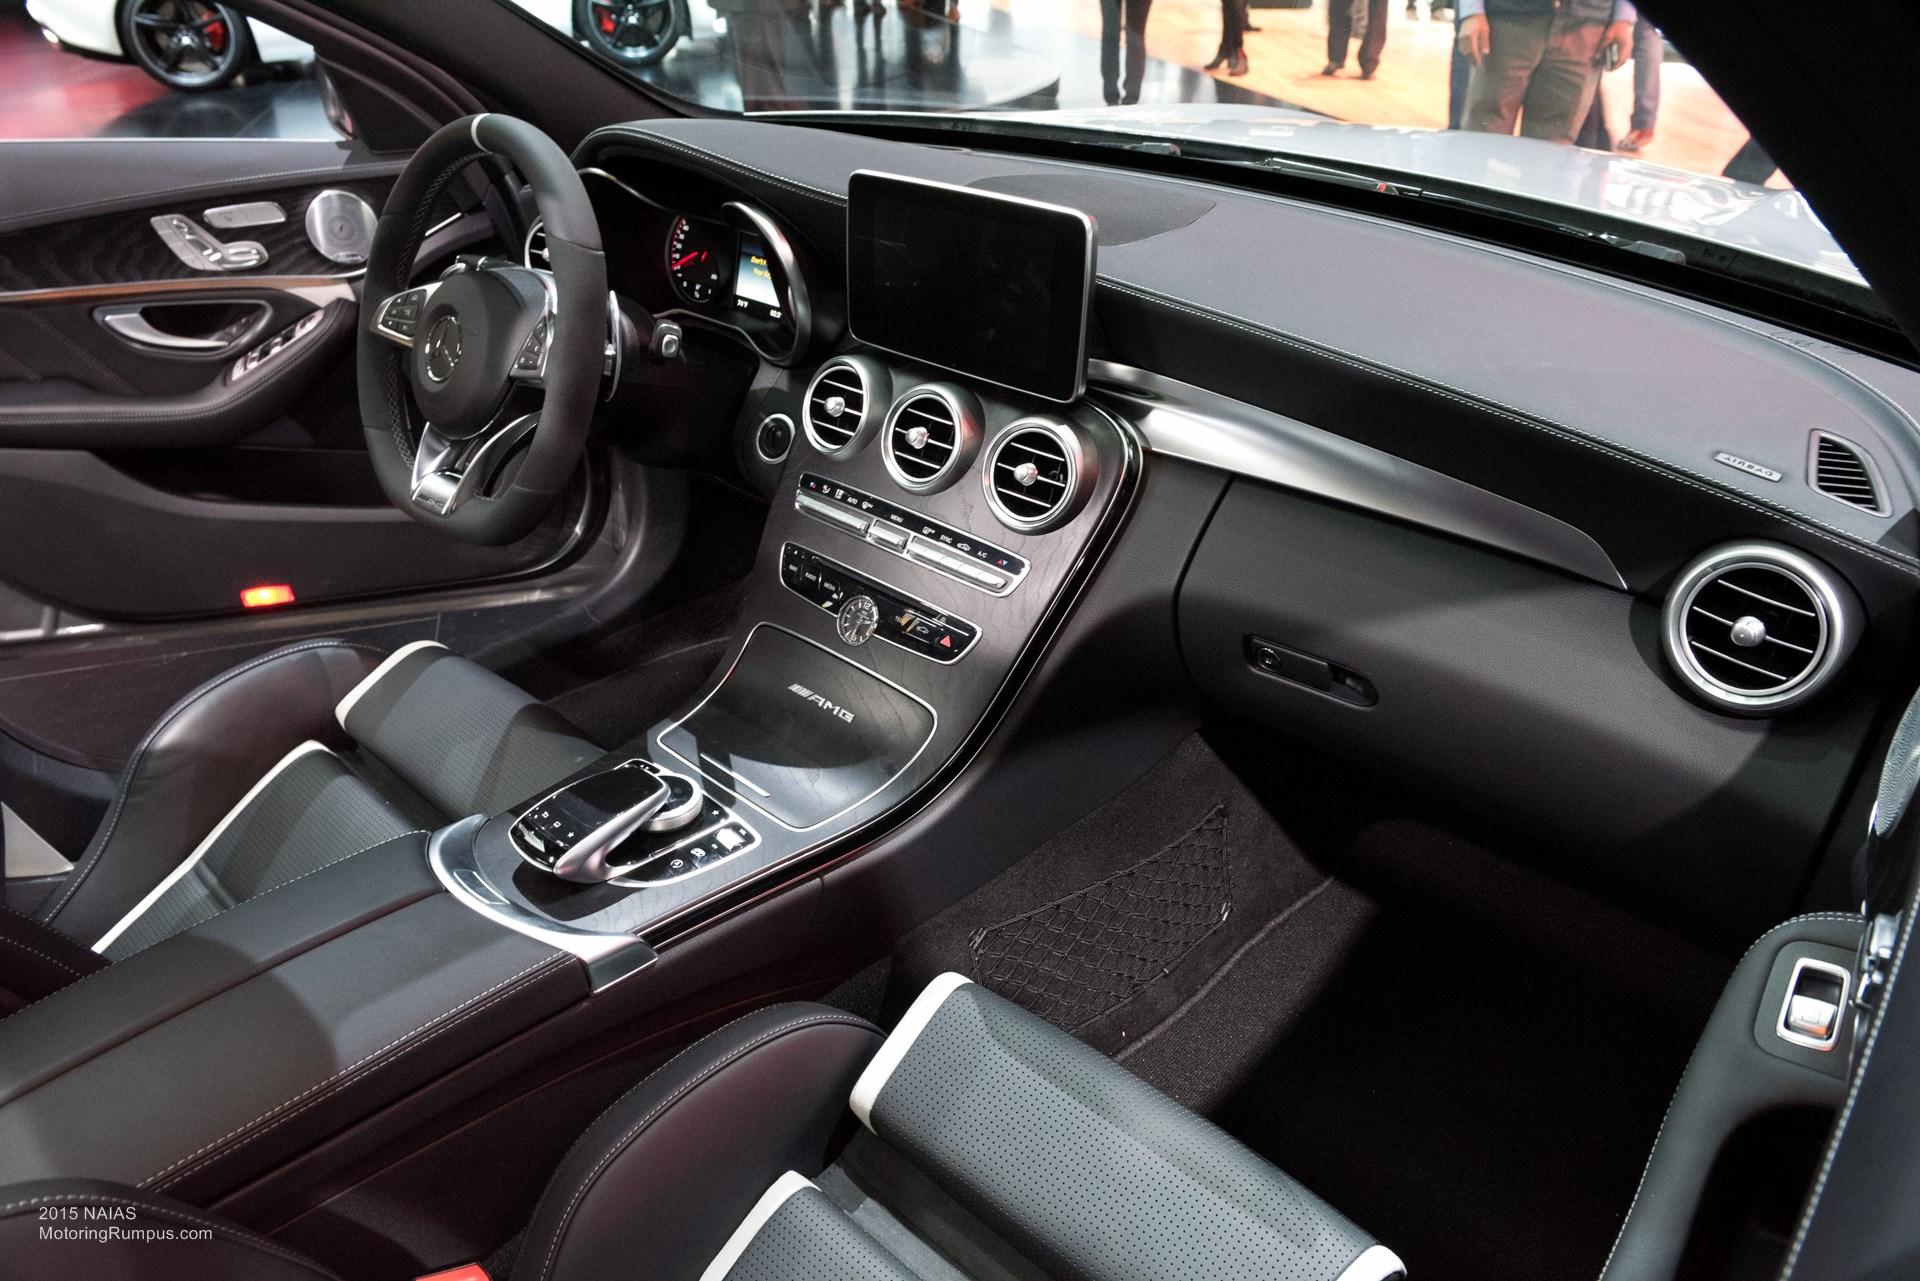 2015 NAIAS Mercedes-AMG C63 S Interior - Motoring Rumpus  2015 NAIAS Merc...